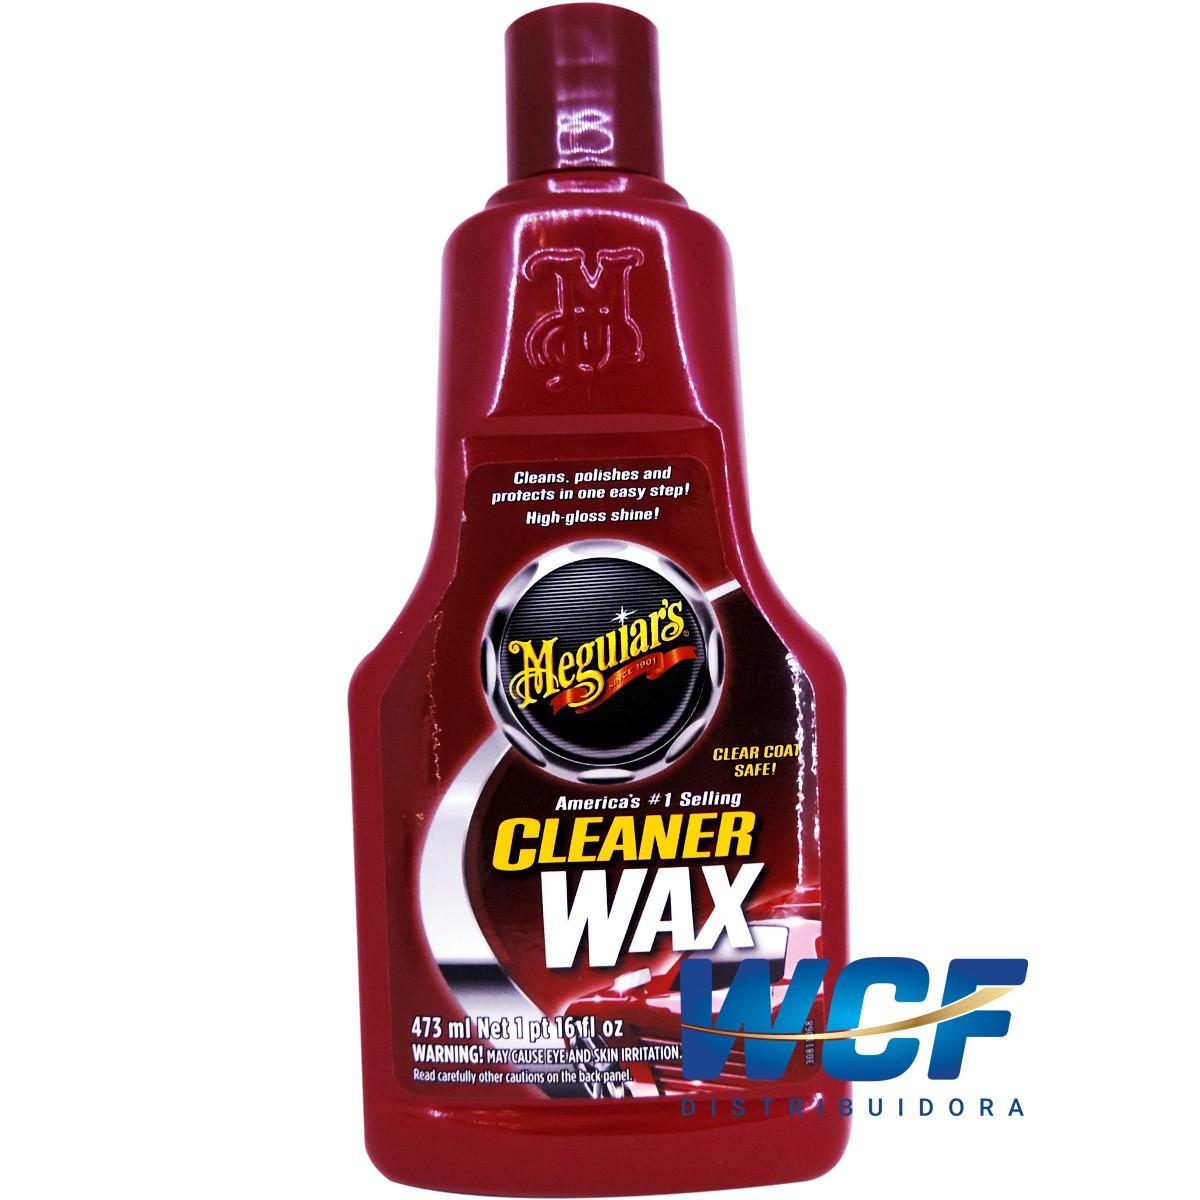 MEGUIARS CERA LIQUIDA CLEANER WAX A1216 473ML